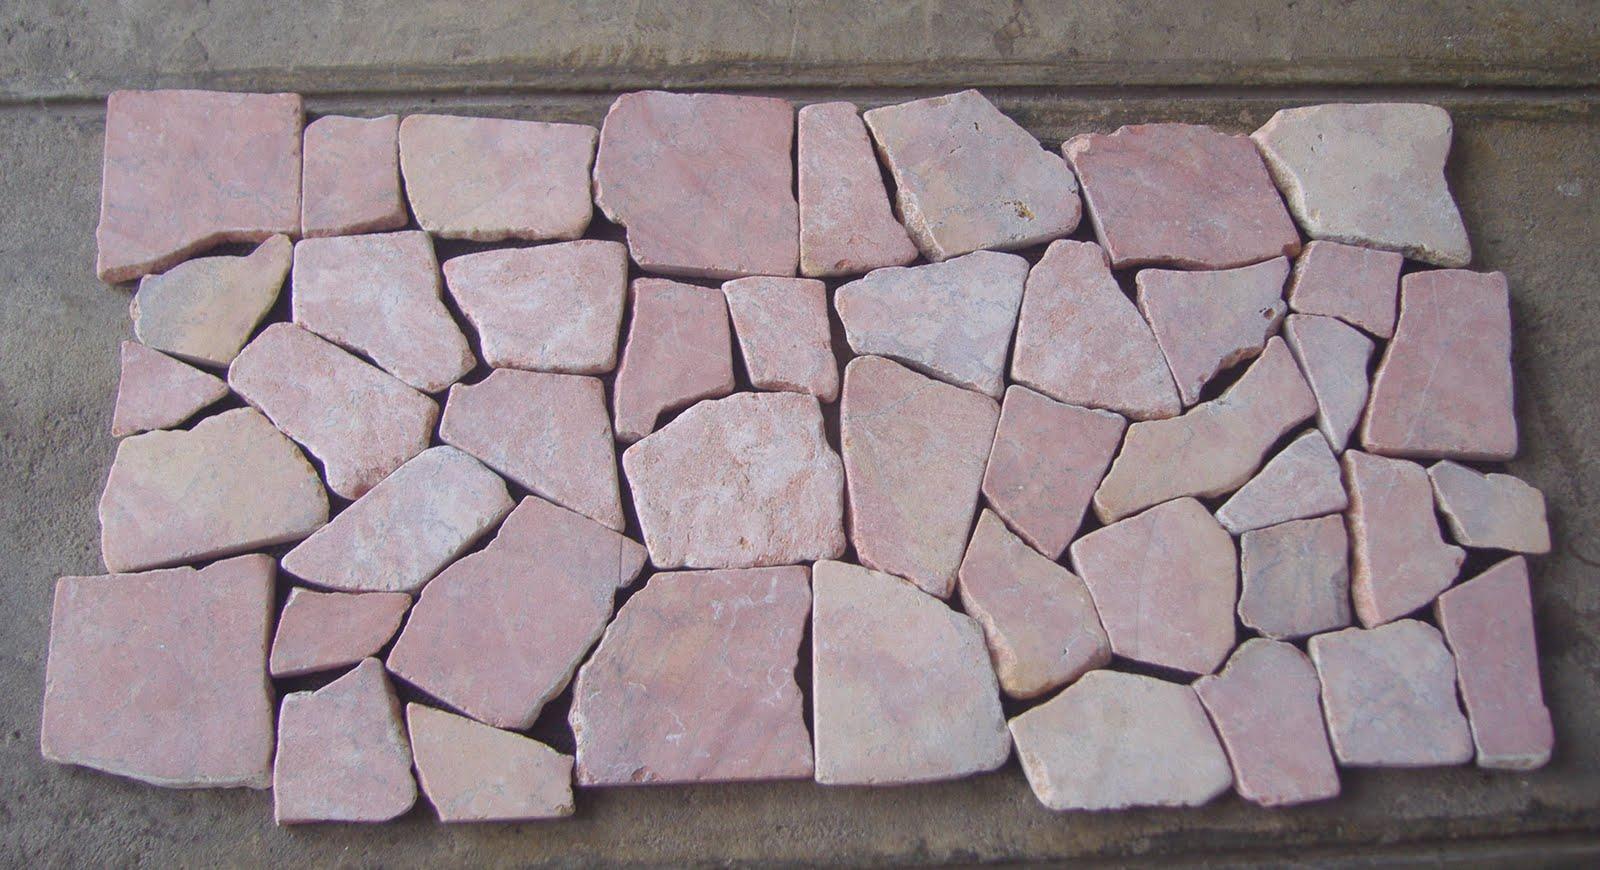 Cobble Stone Mosaics : Mosaic paver and cobble stone